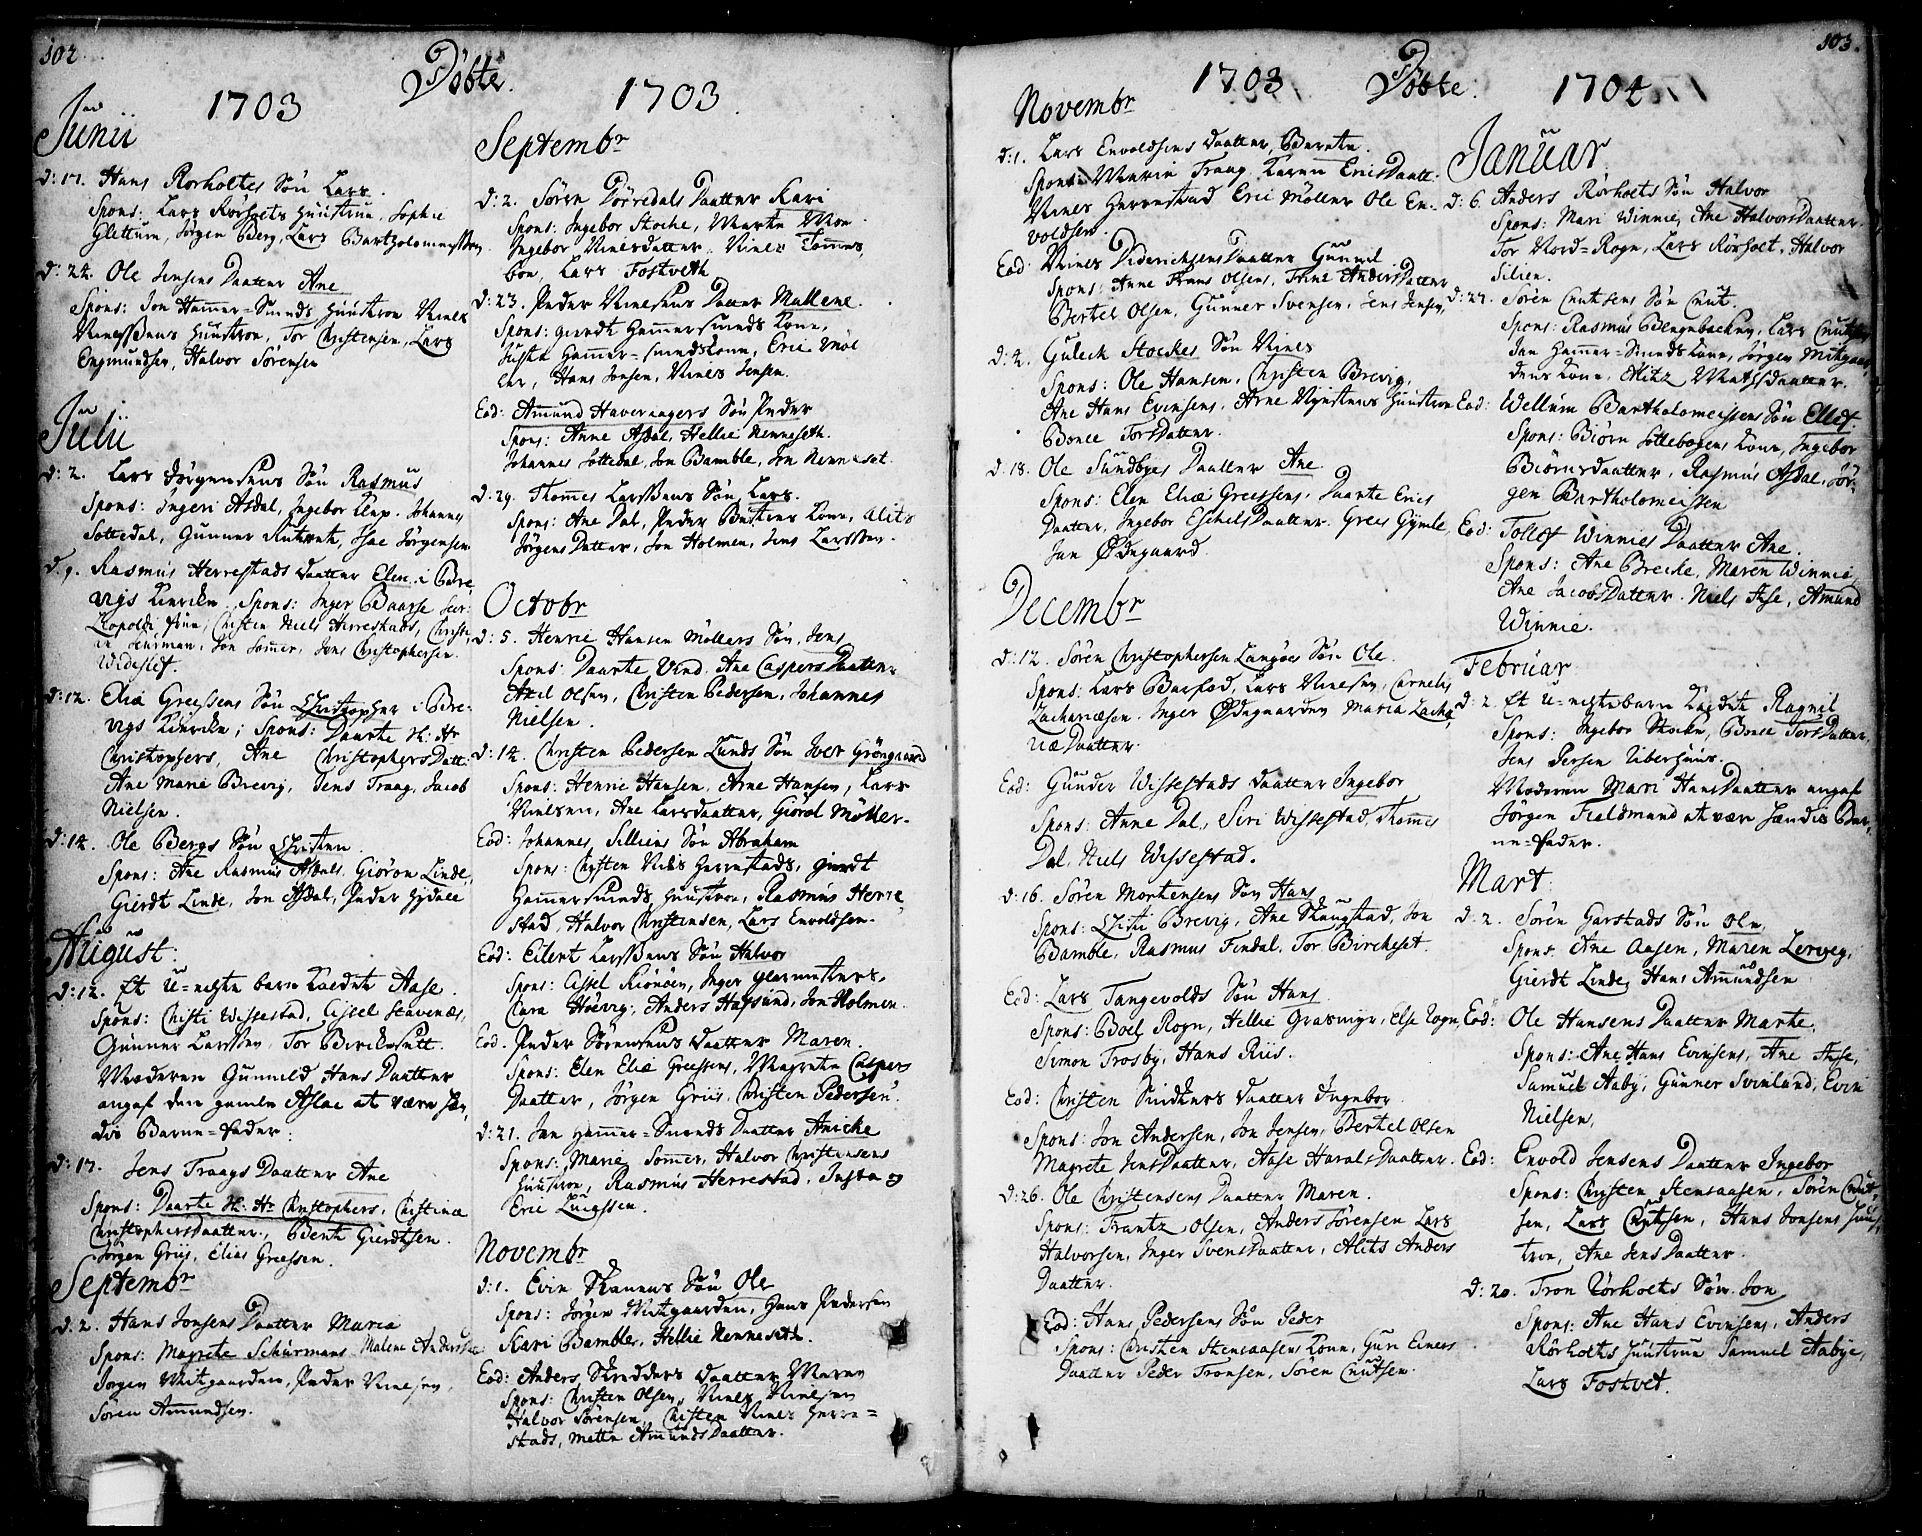 SAKO, Bamble kirkebøker, F/Fa/L0001: Ministerialbok nr. I 1, 1702-1774, s. 102-103